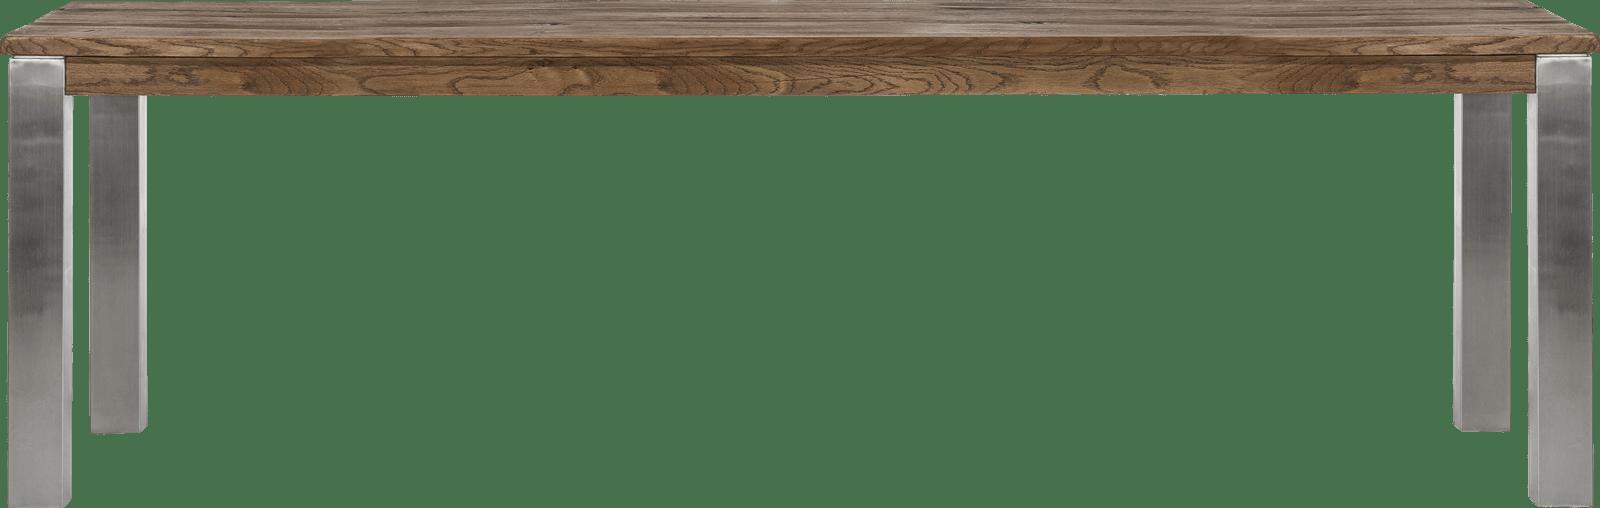 Masters - eetkamertafel 260 x 100 cm - rvs 9x9